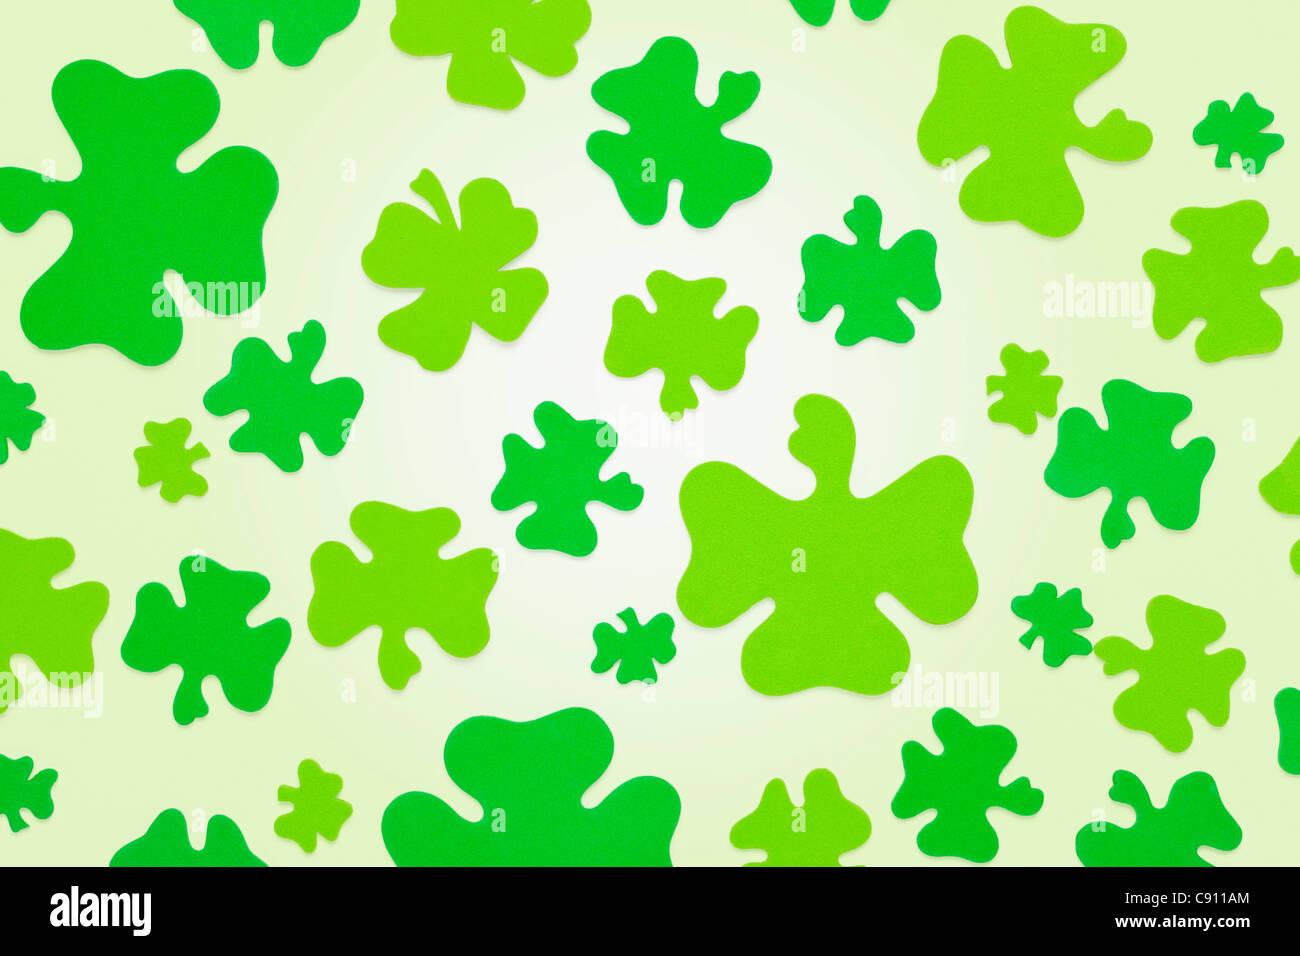 Green shamrock pattern - Stock Image